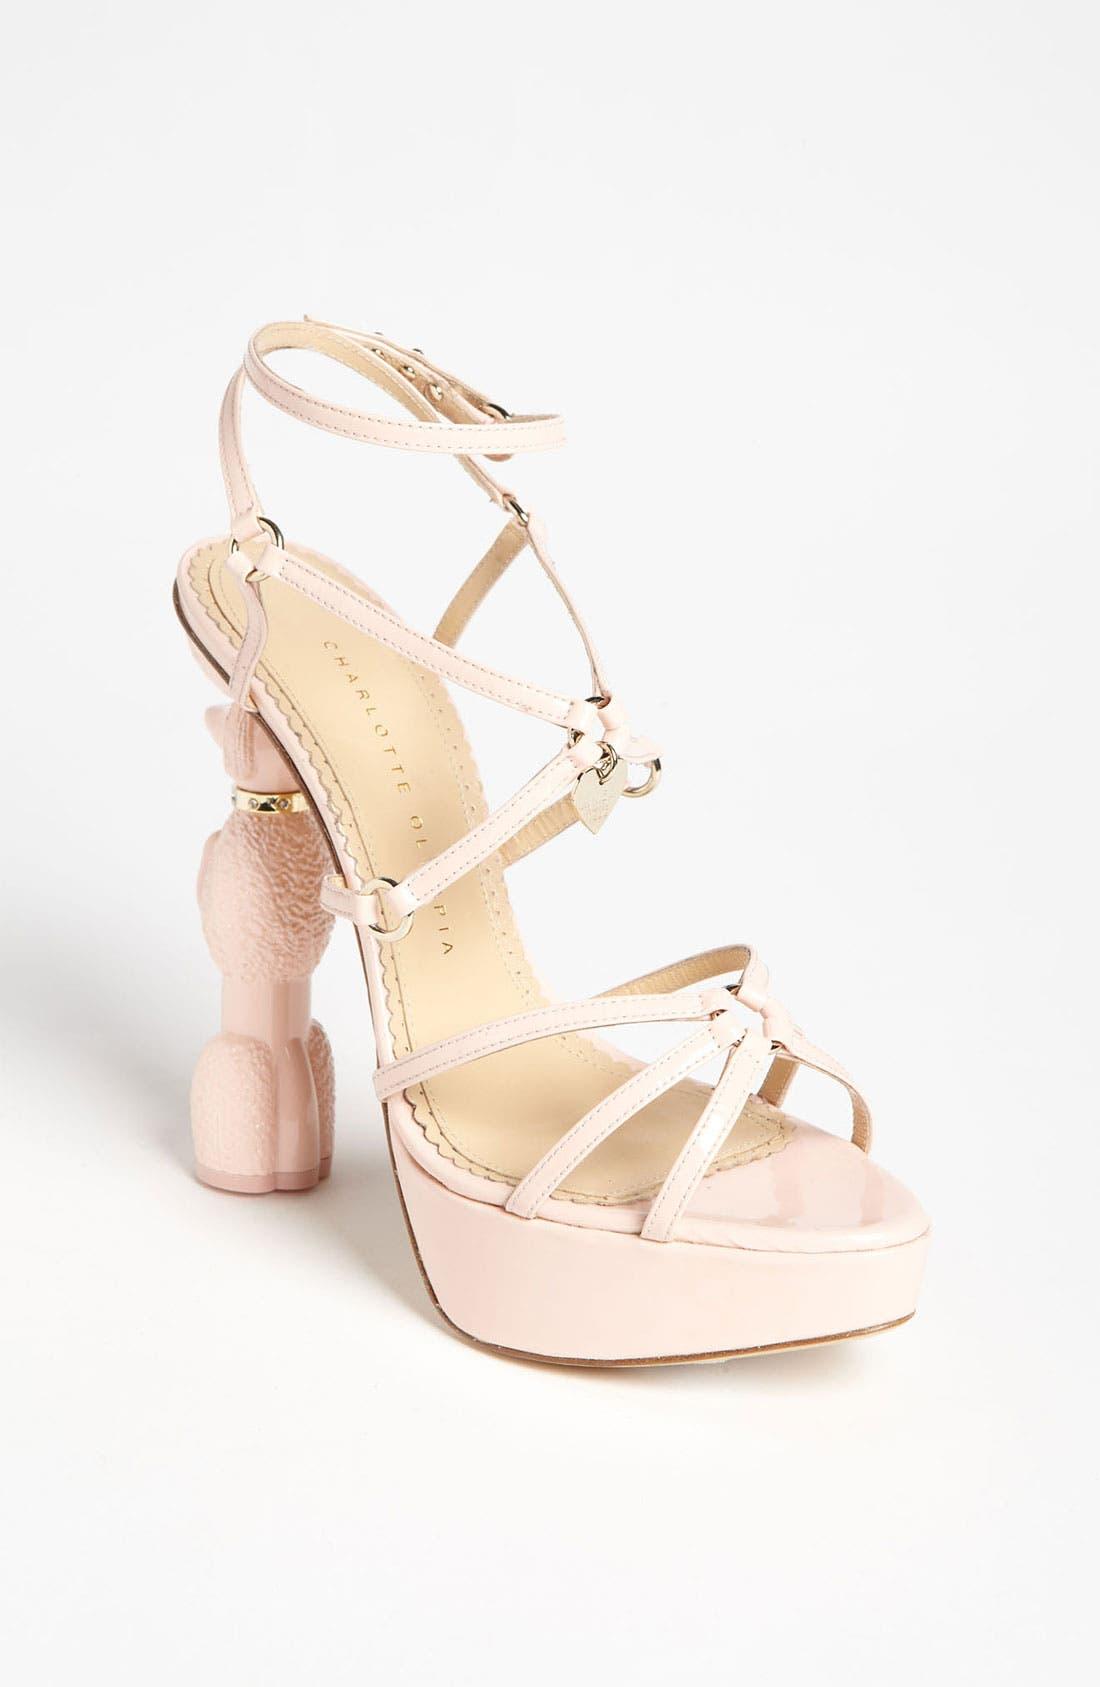 CHARLOTTE OLYMPIA 'Cherie' Sandal, Main, color, 680